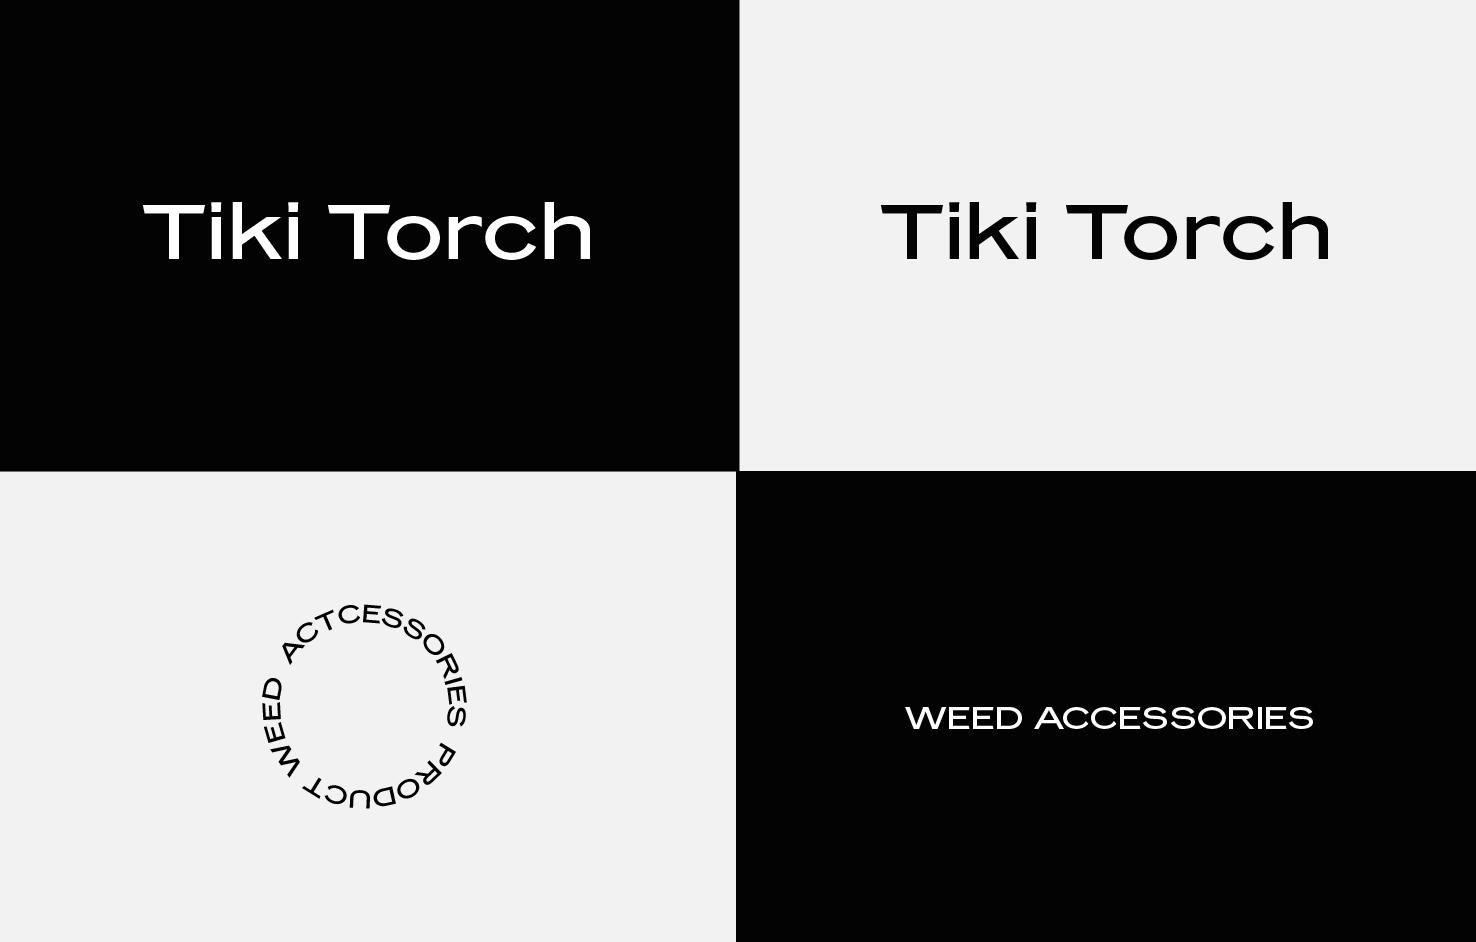 tikitorch-weed-logo2